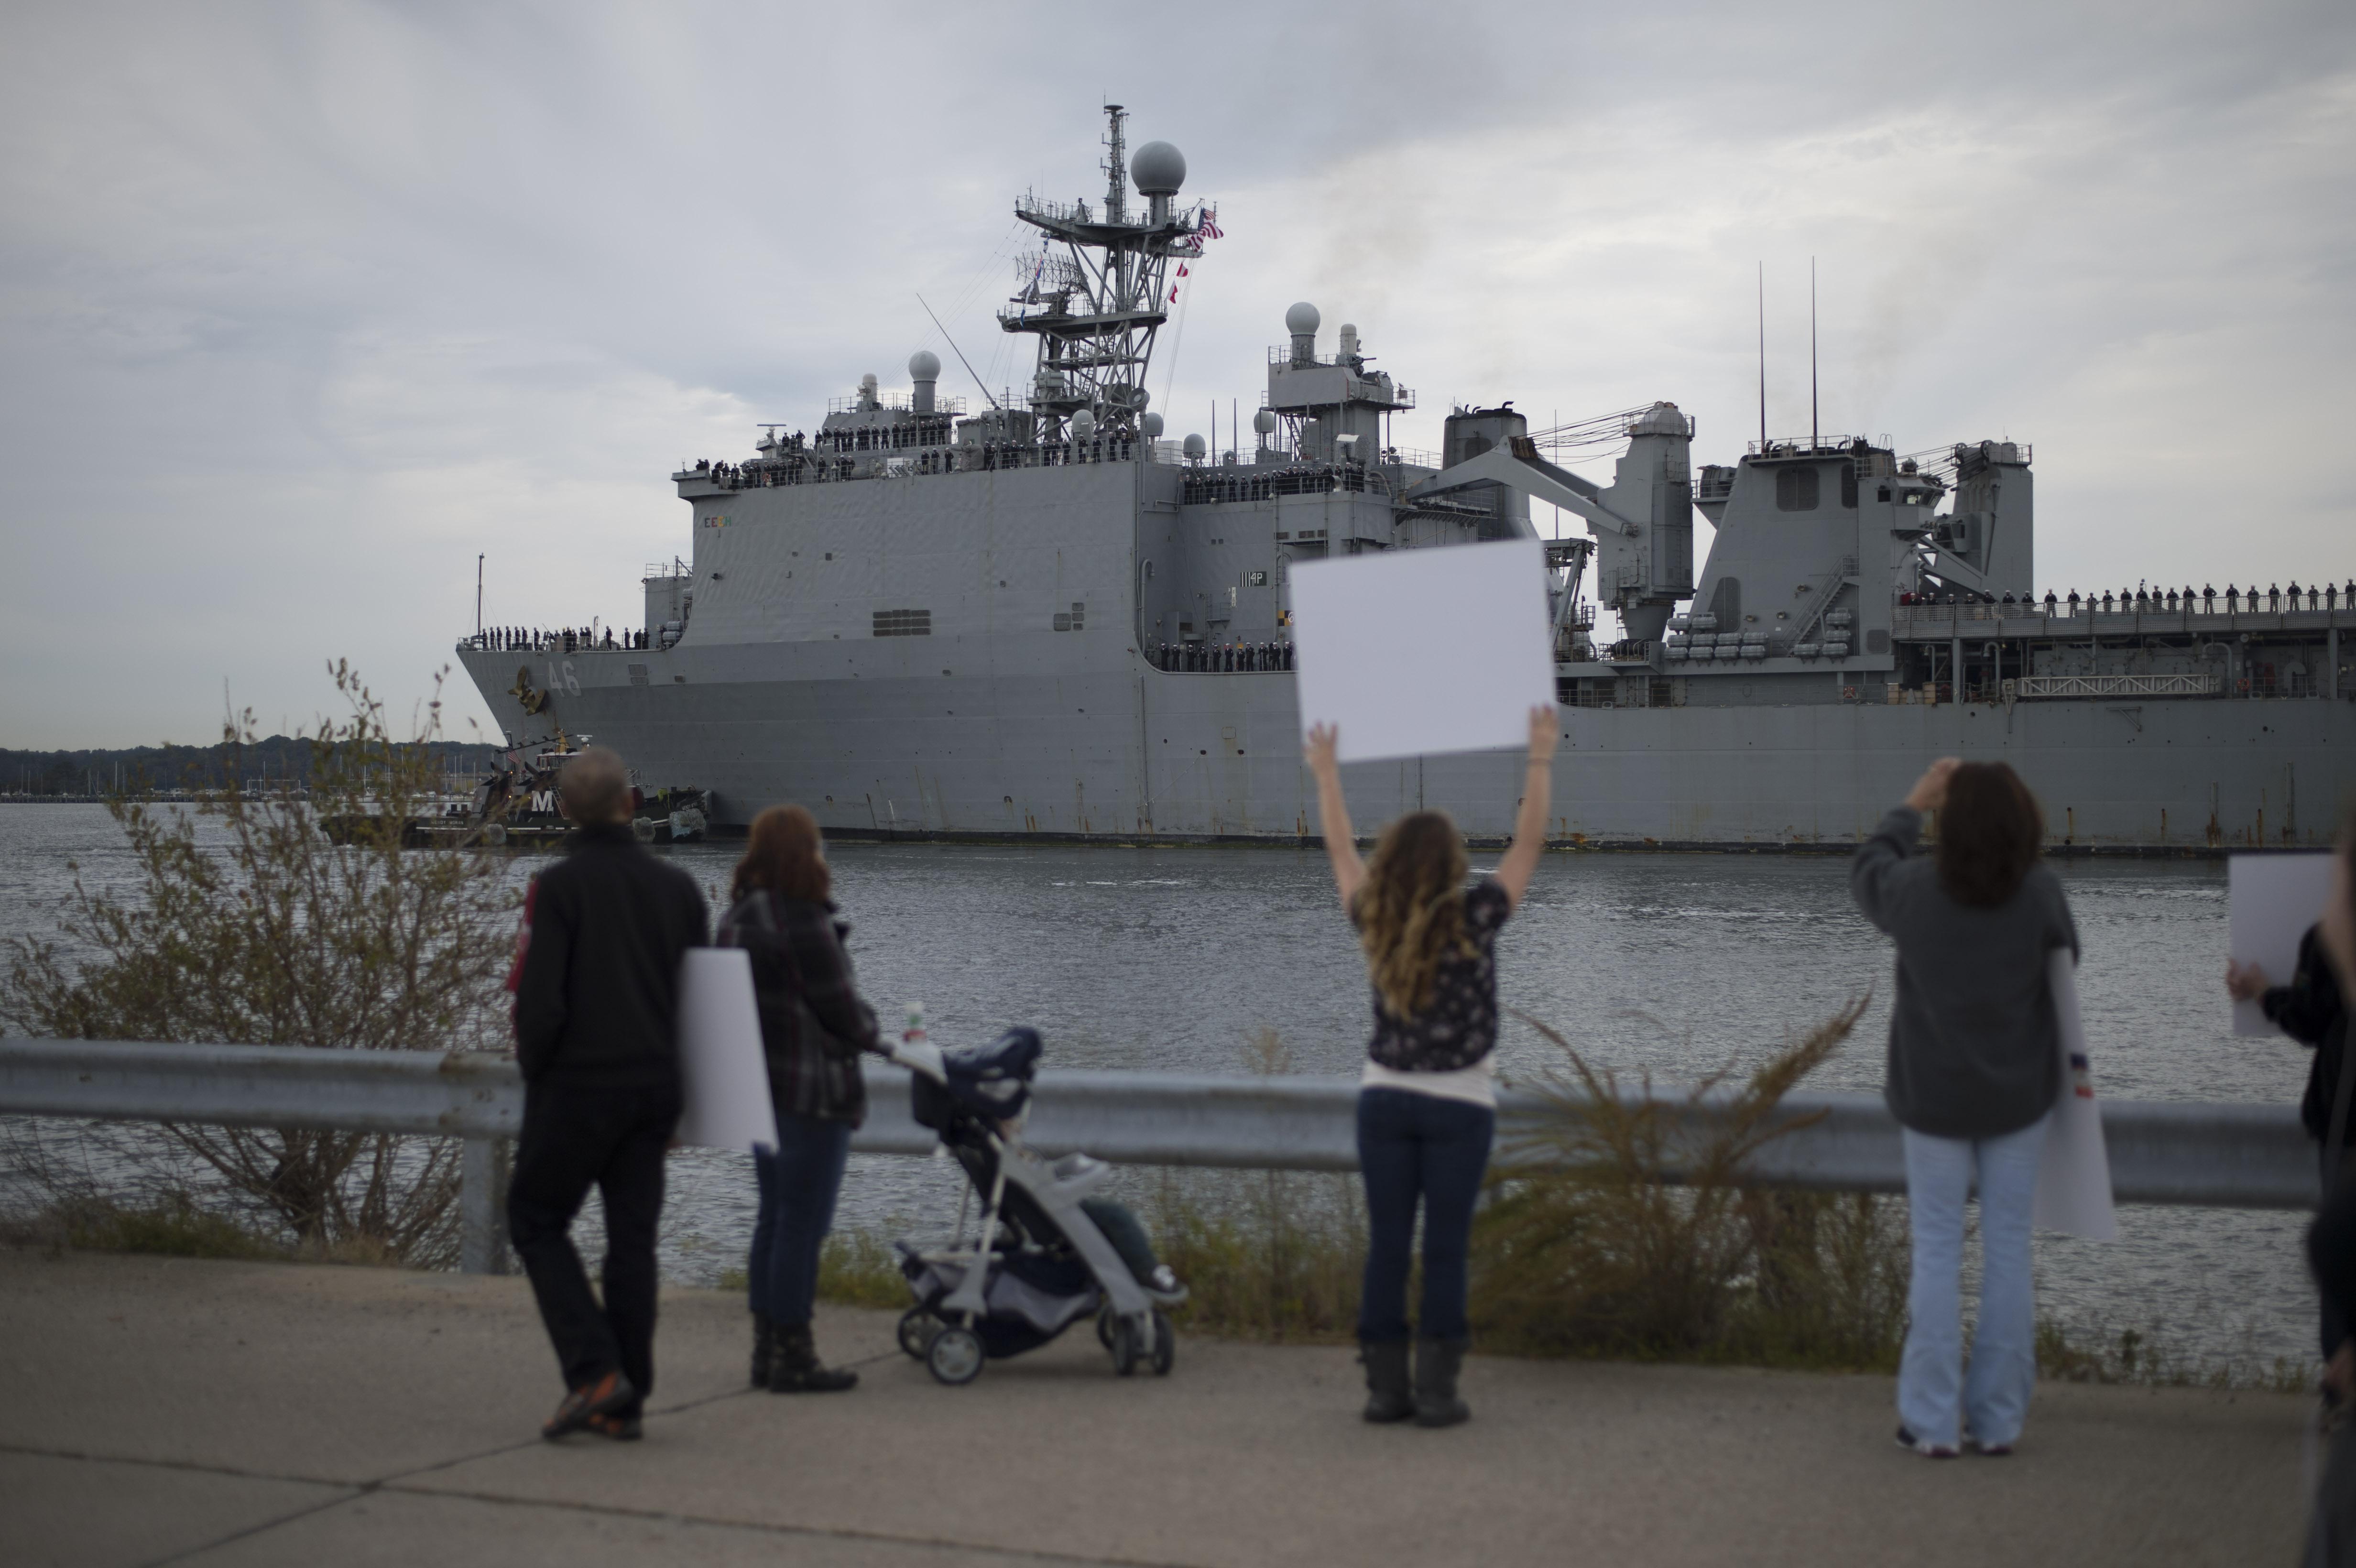 USS TORTUGA LSD-46 Einlaufen Little Creek, VA am 22.10.2013Bild: U.S. Navy